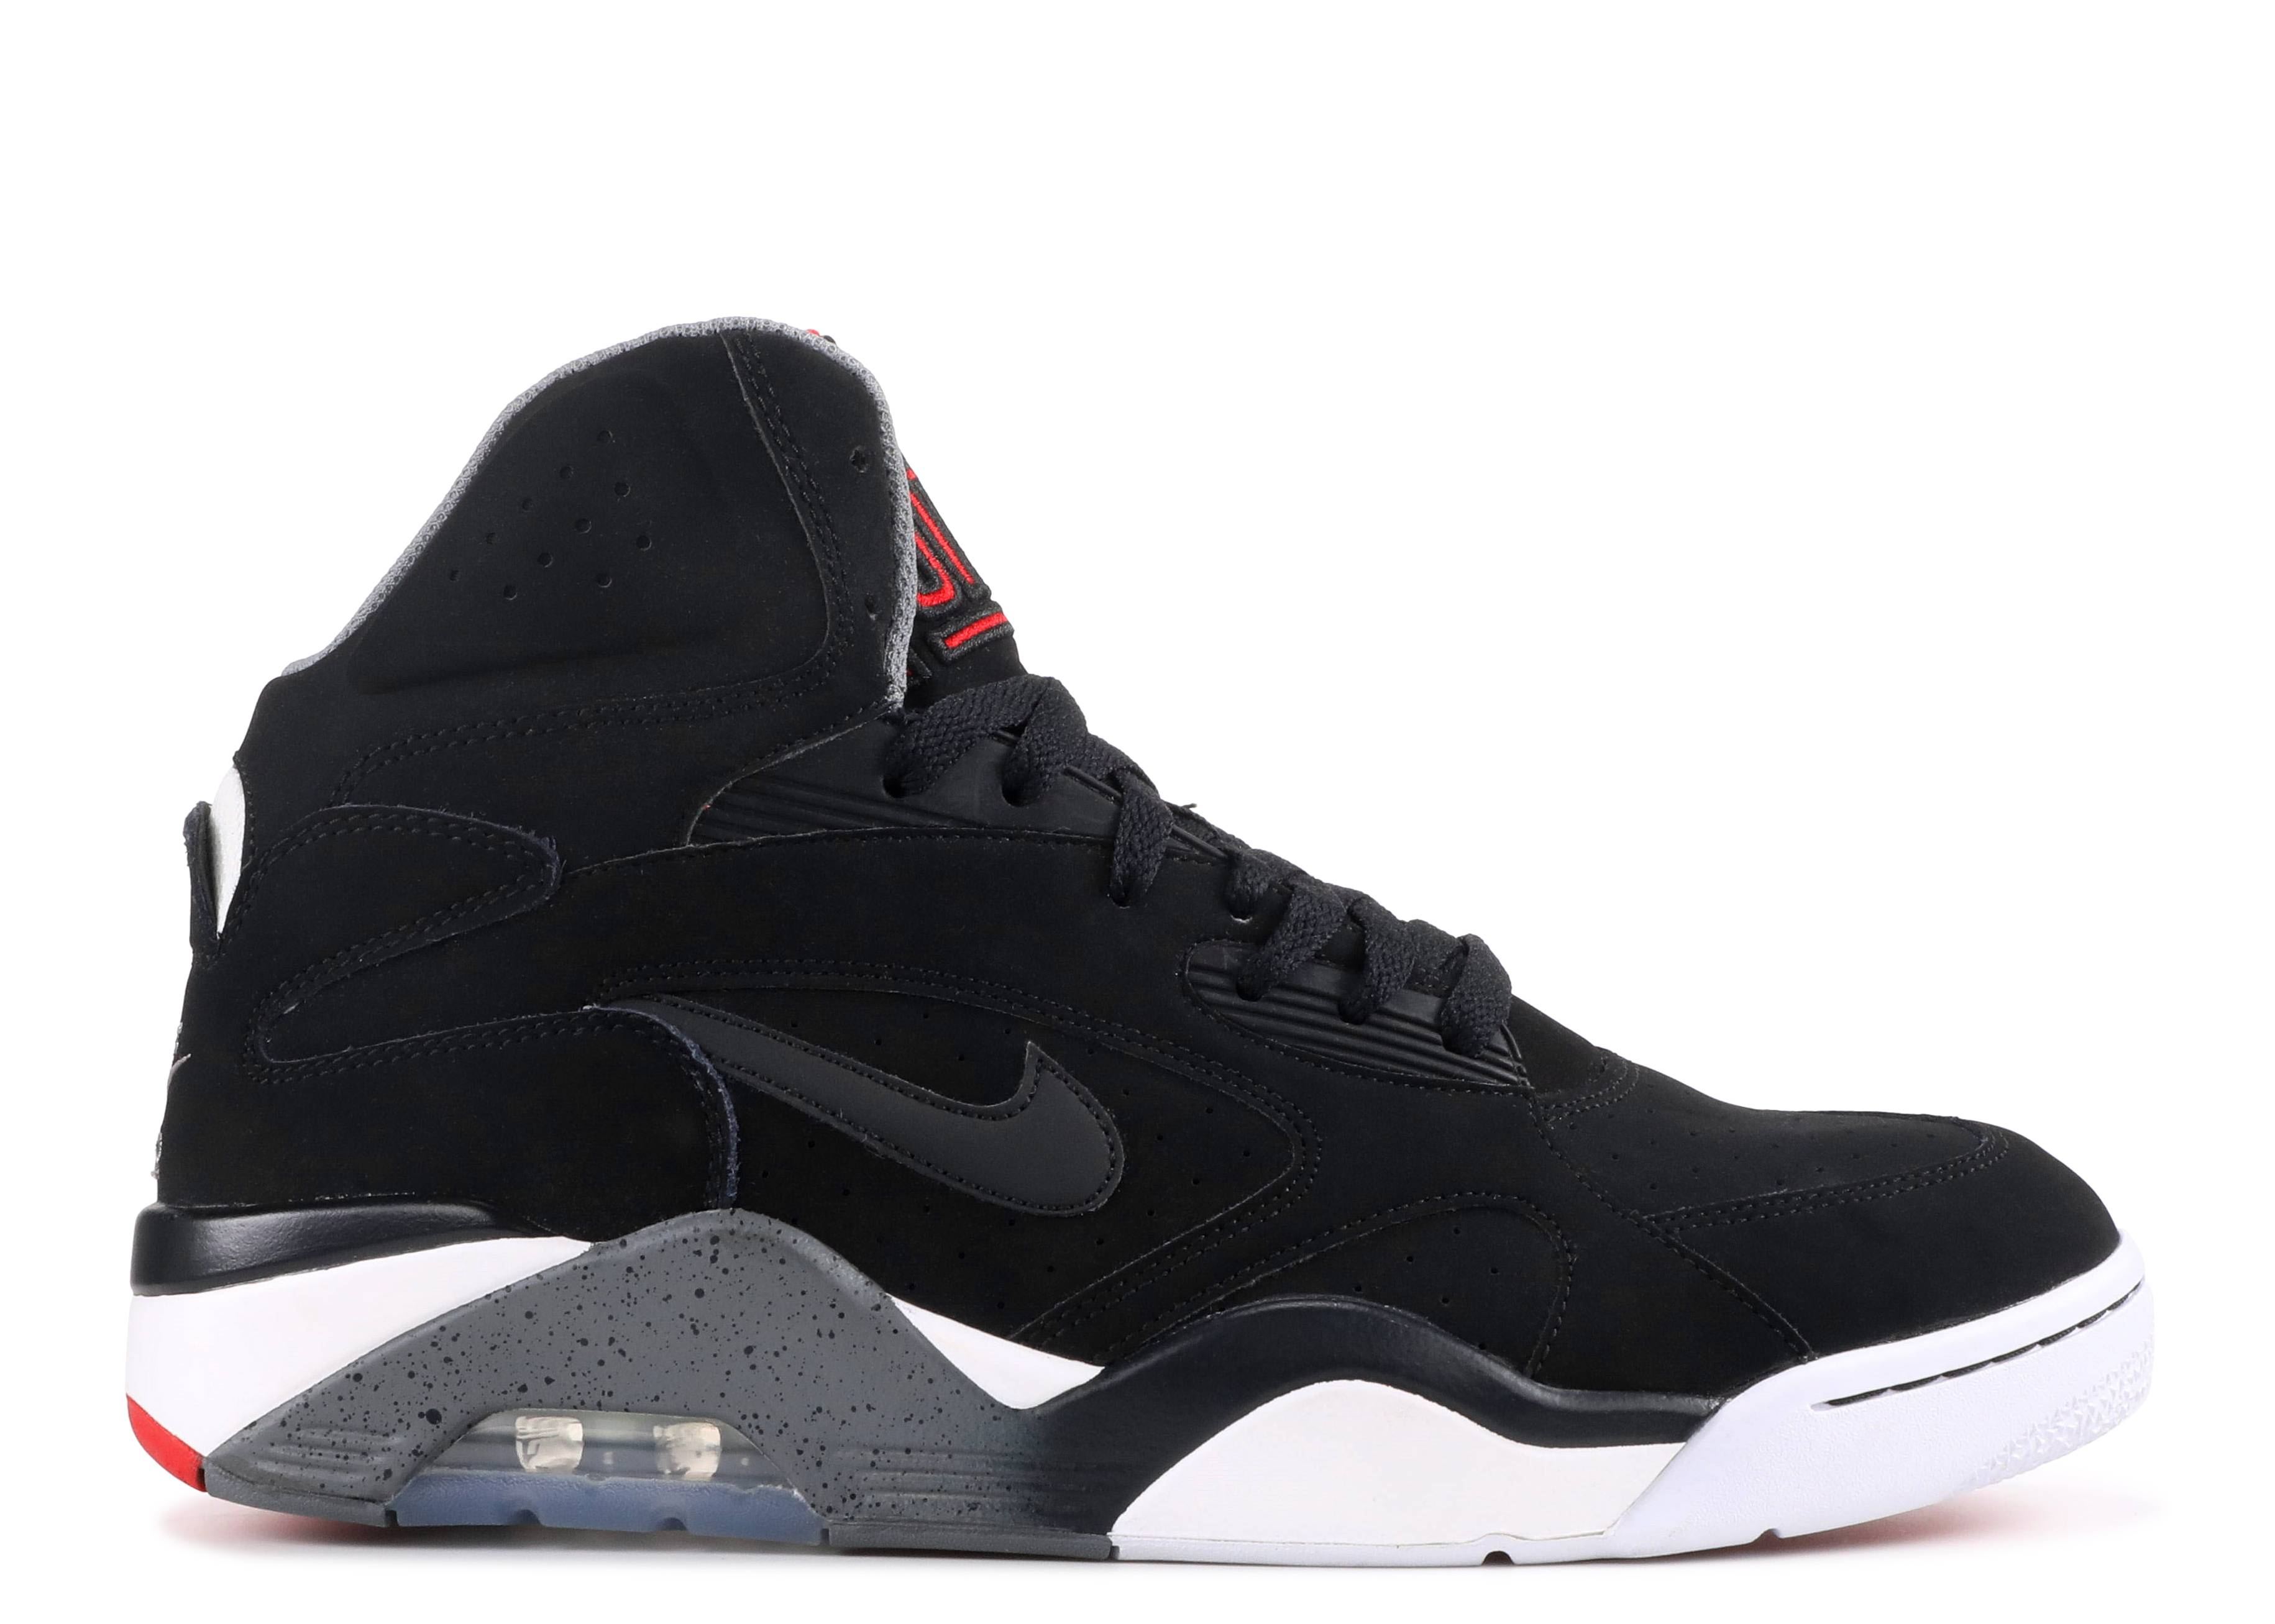 premium selection 8302e 76267 Nike Air Force 180 Mid - Nike - 537330 002 - black/cool grey-university red  | Flight Club